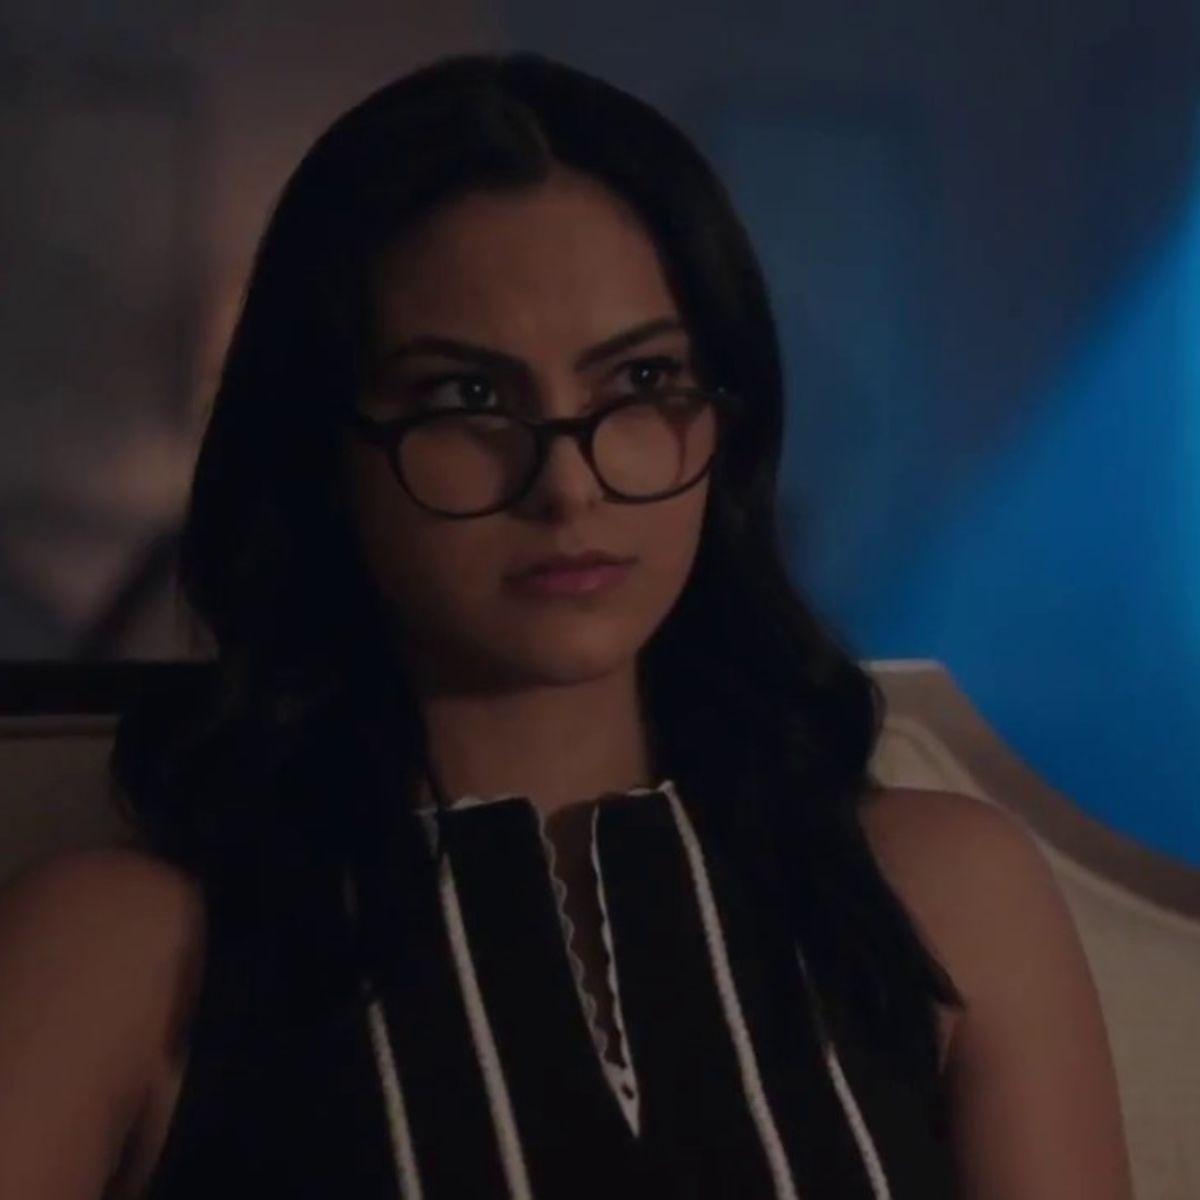 Riverdale - Veronica - Karma's a Bitch